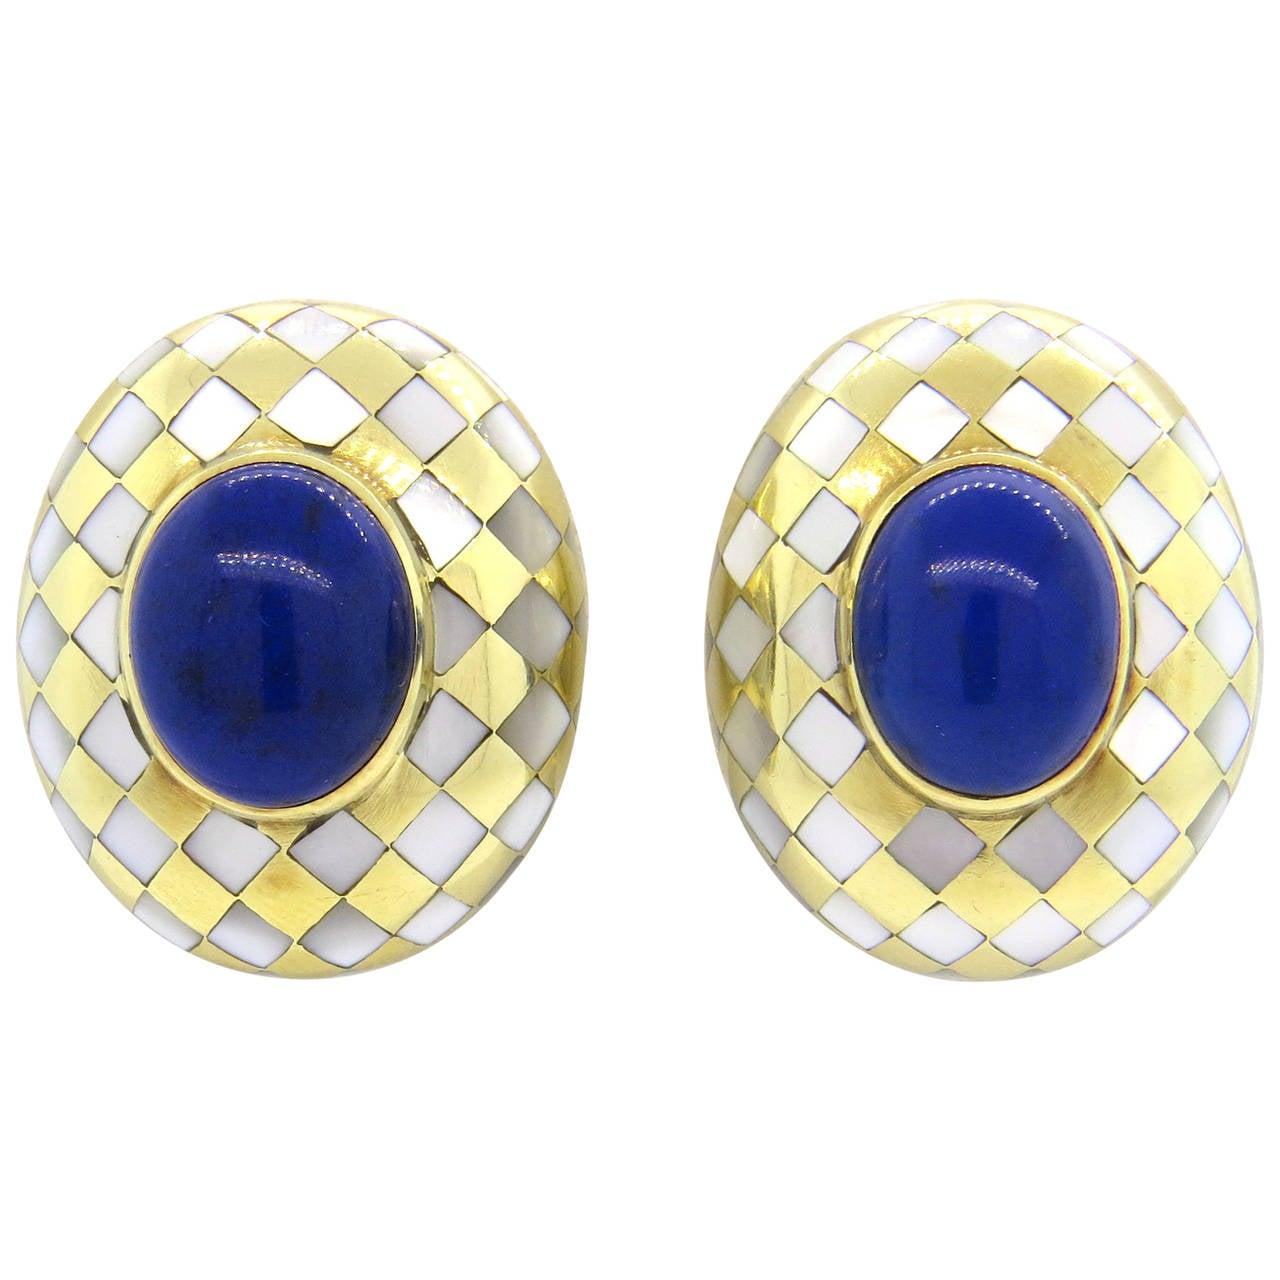 Angela Cummings Lapis Mother of Pearl Gold Earrings